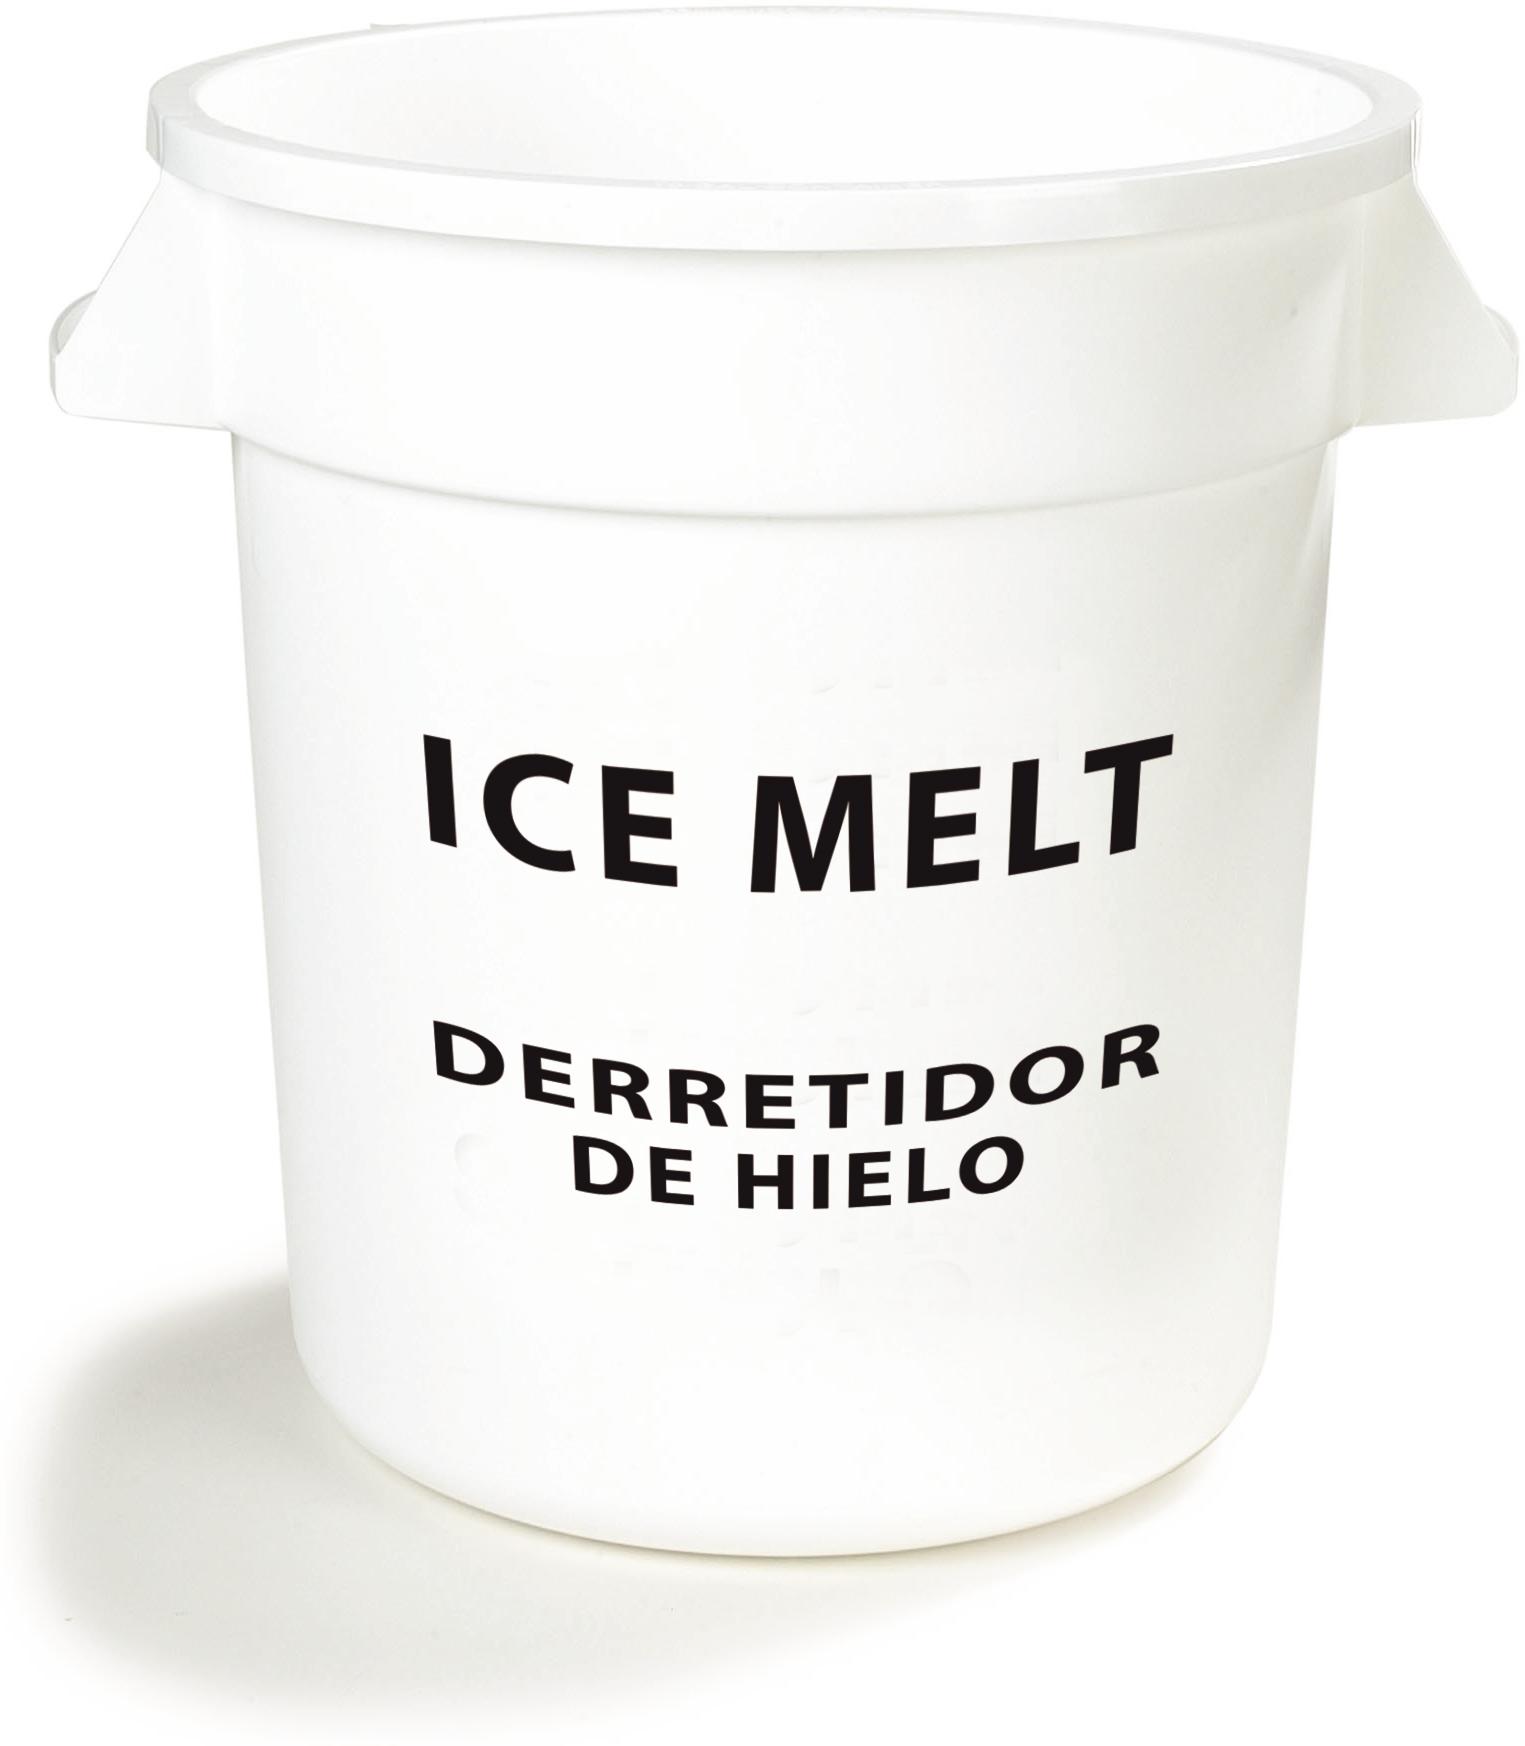 Bronco Round ICE MELT Container 20 Gallon - Ice Melt - White